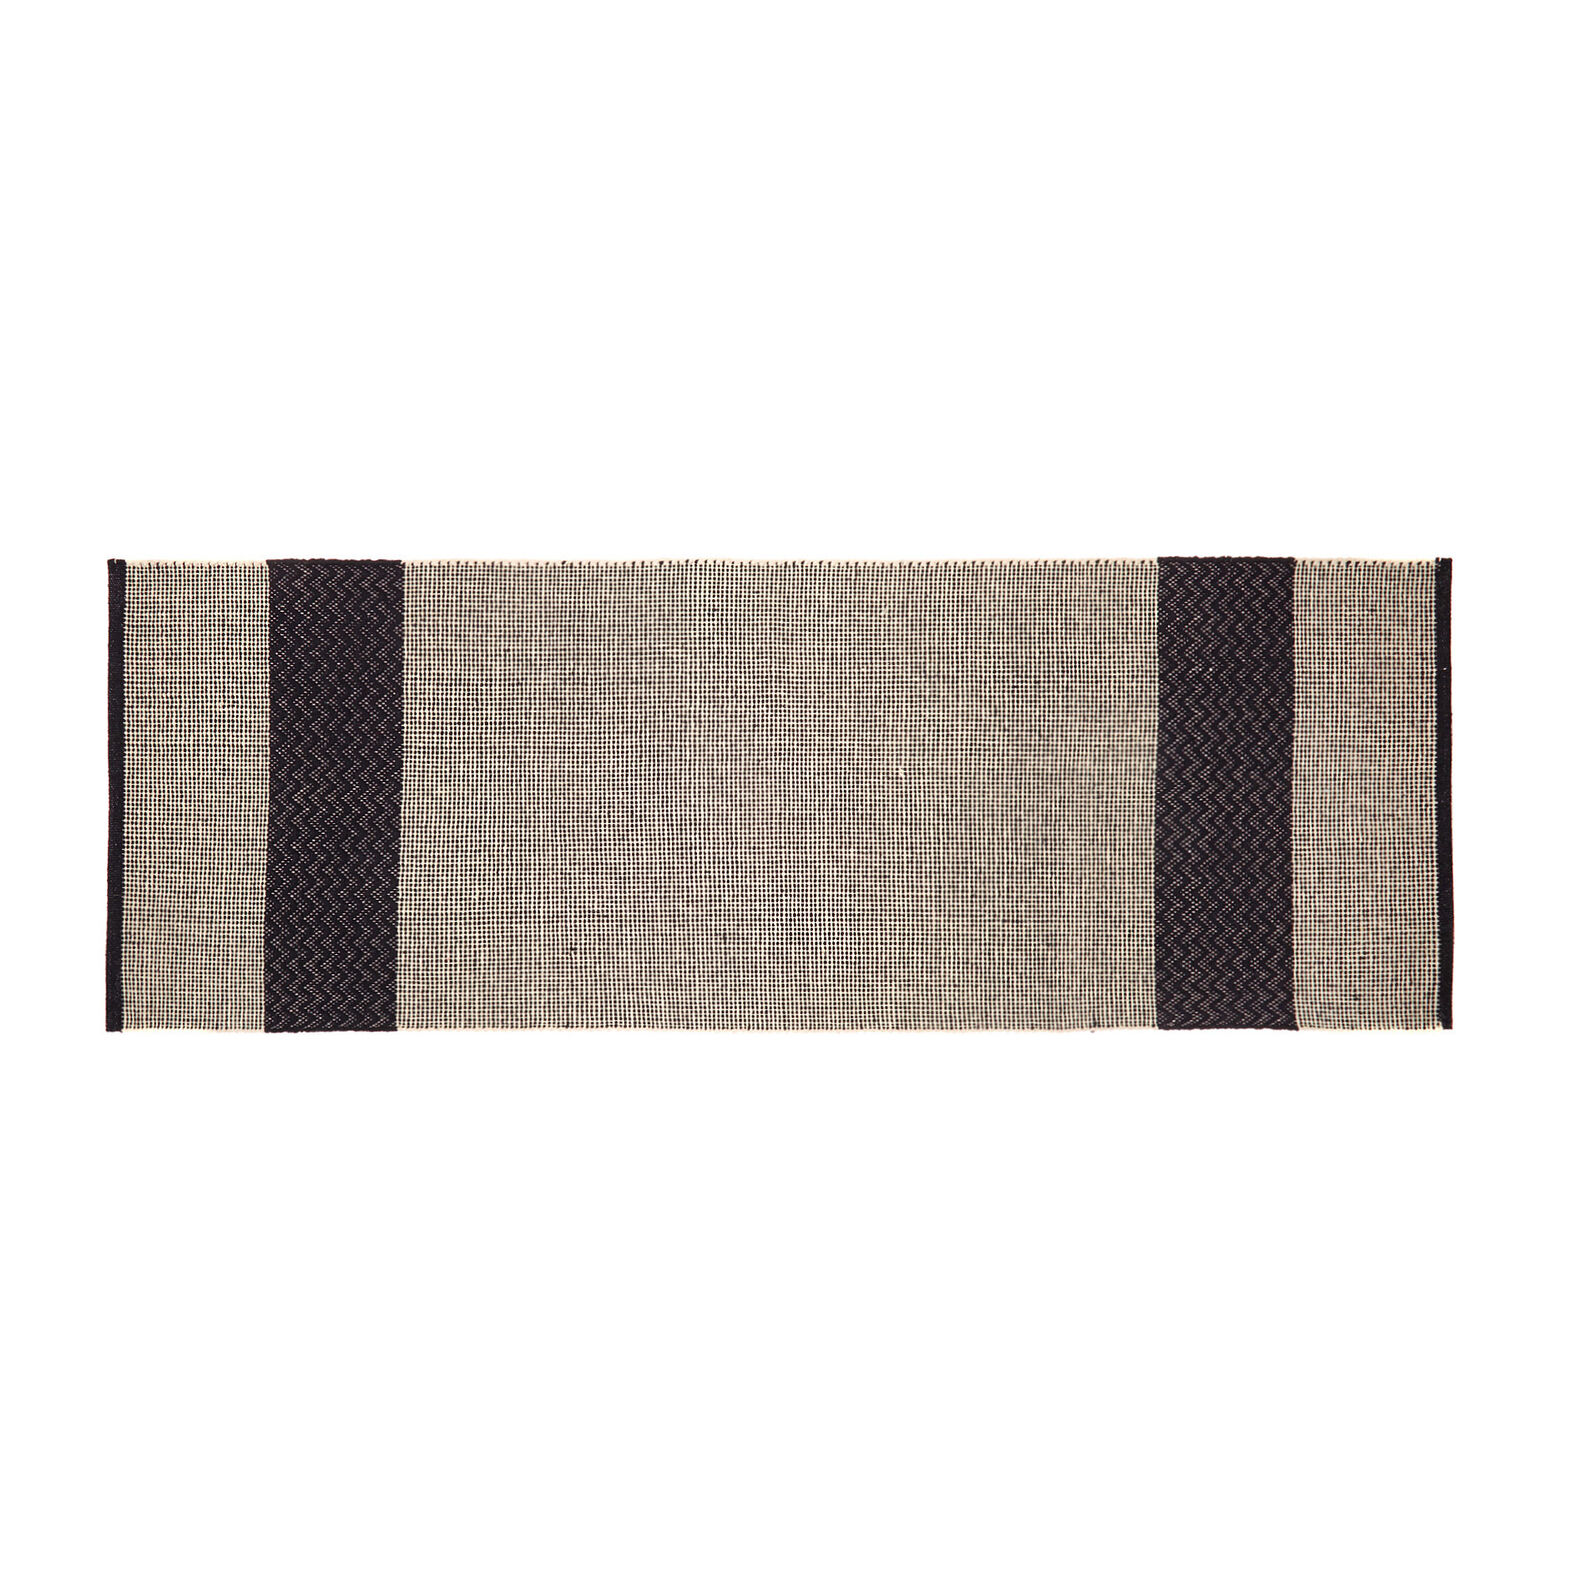 Cotton kitchen mat with jacquard weave